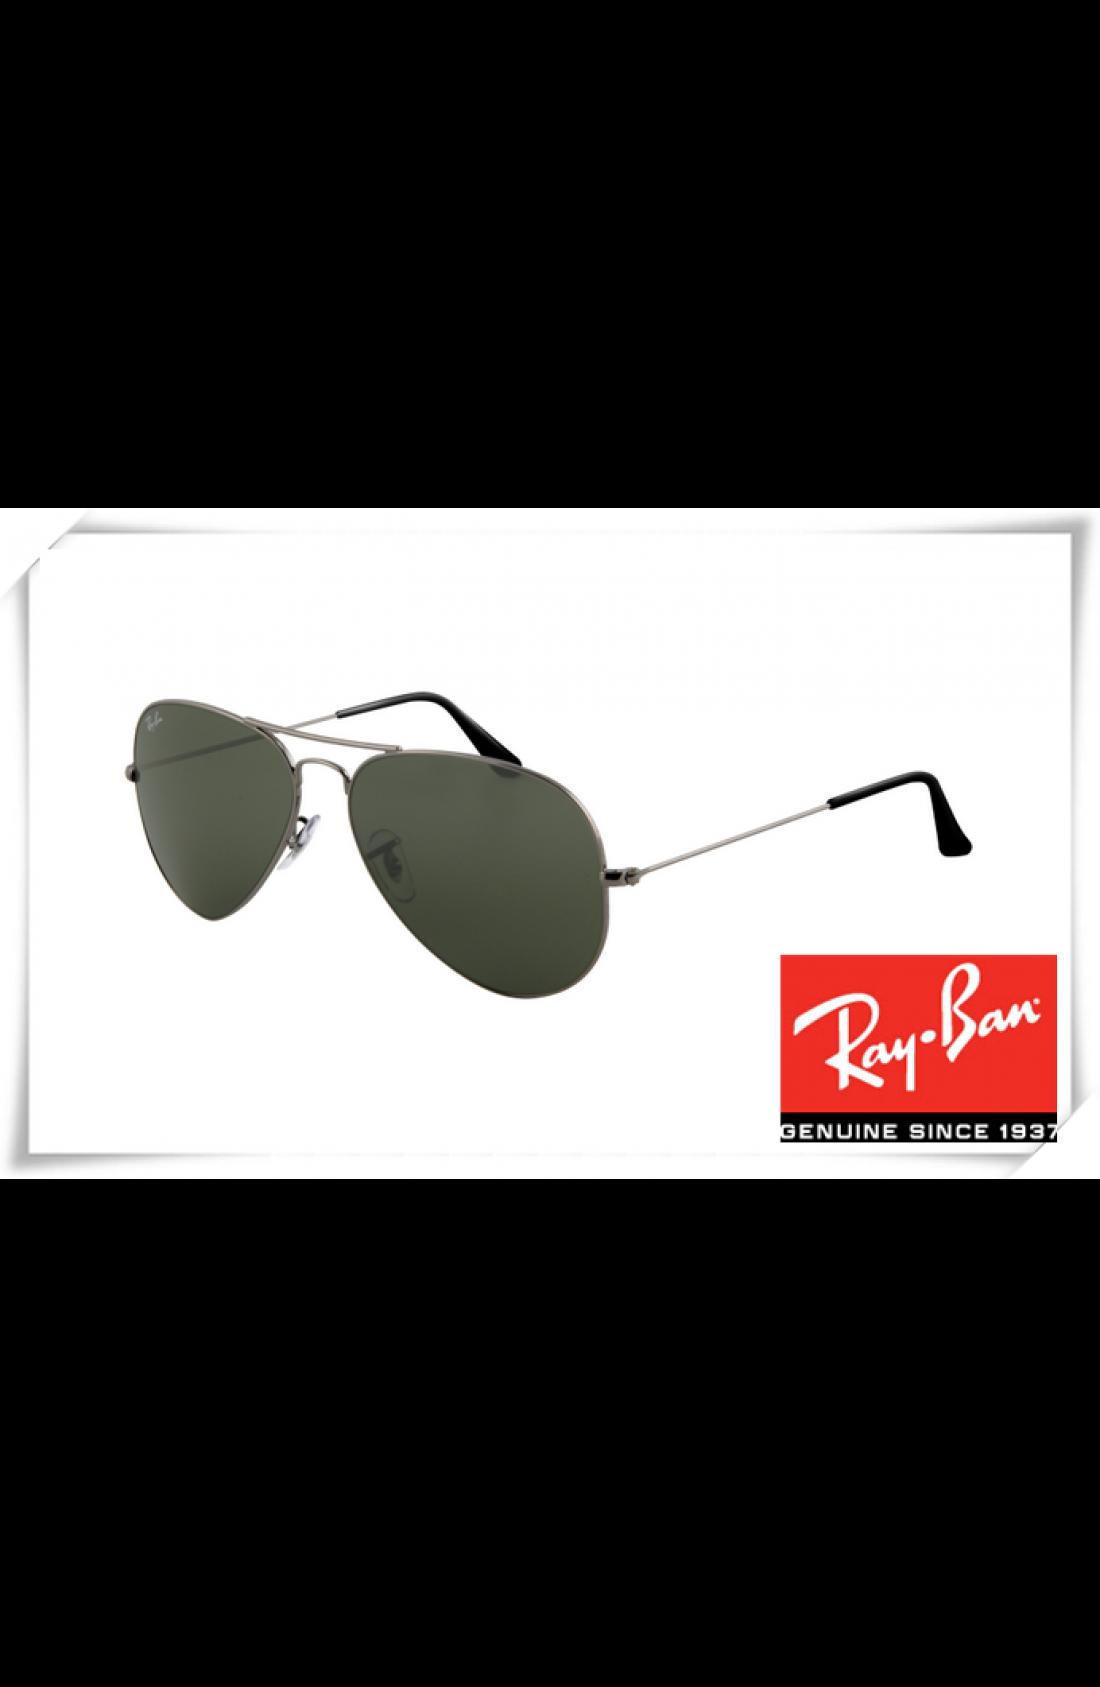 d8eae401c8a Cheap Fake Ray Ban RB3025 Aviator Sunglasses Gunmetal Frame Deep ...